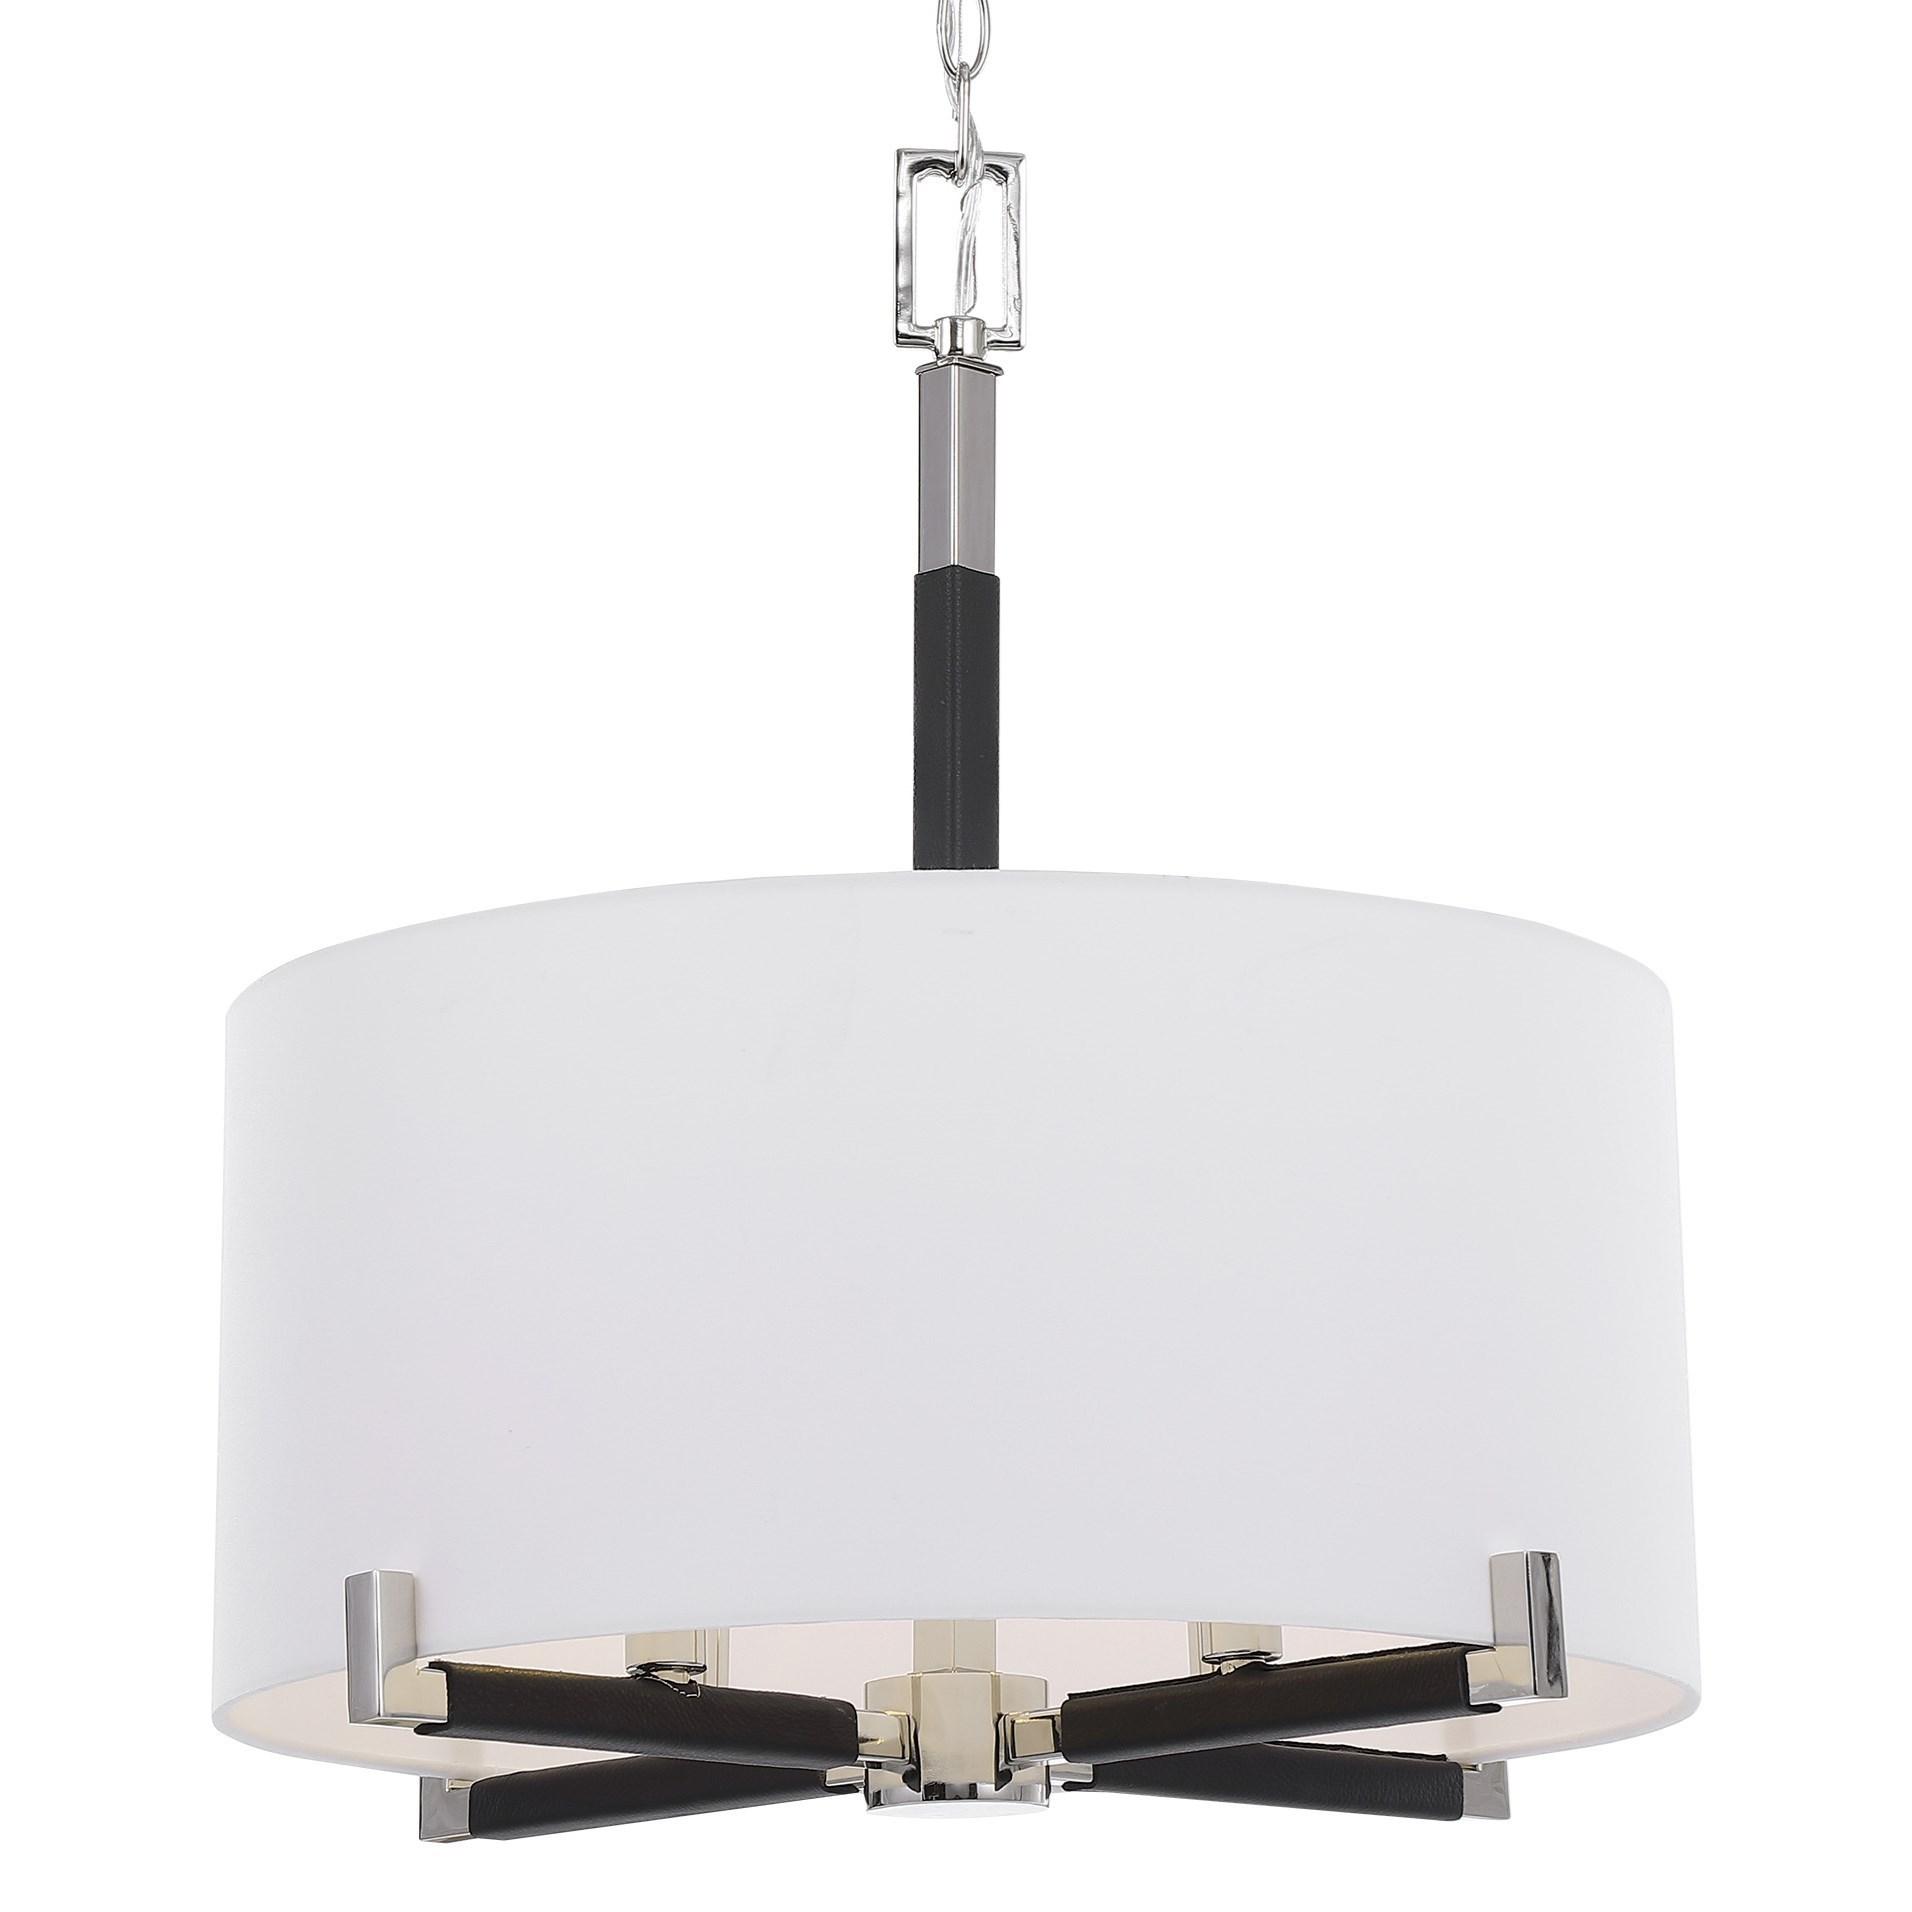 Lighting Fixtures - Pendant Lights Newburgh 4 Light Drum Pendant by Uttermost at Mueller Furniture